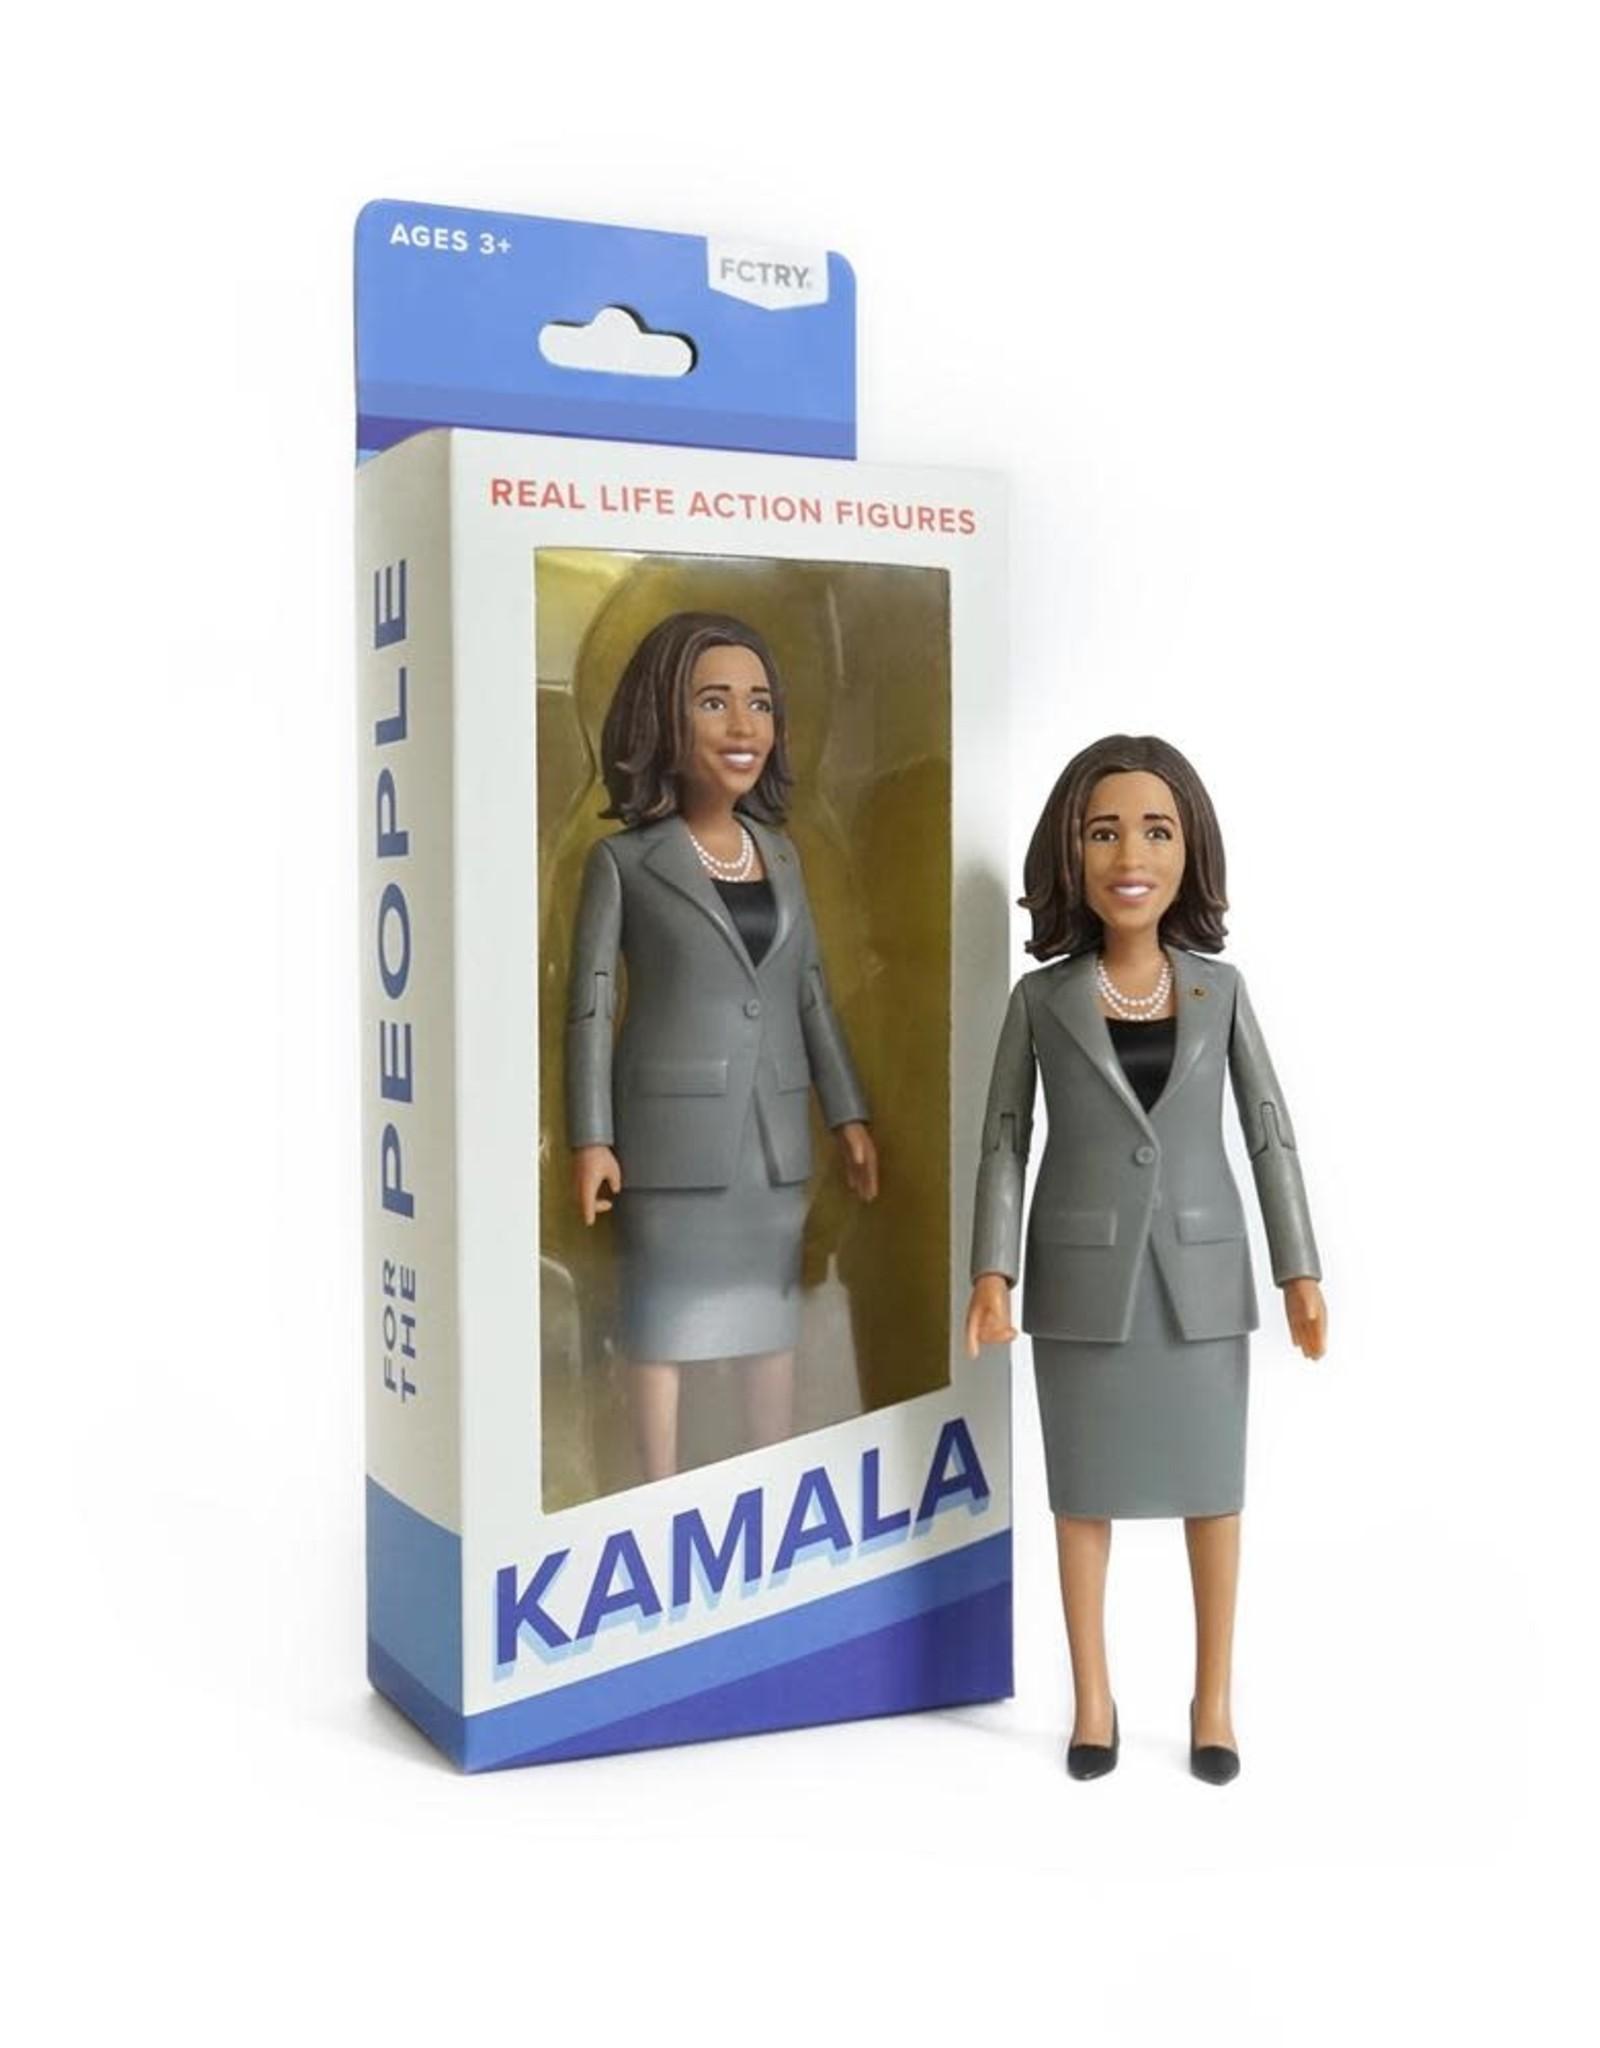 FCTRY Action Figure: Kamala Harris